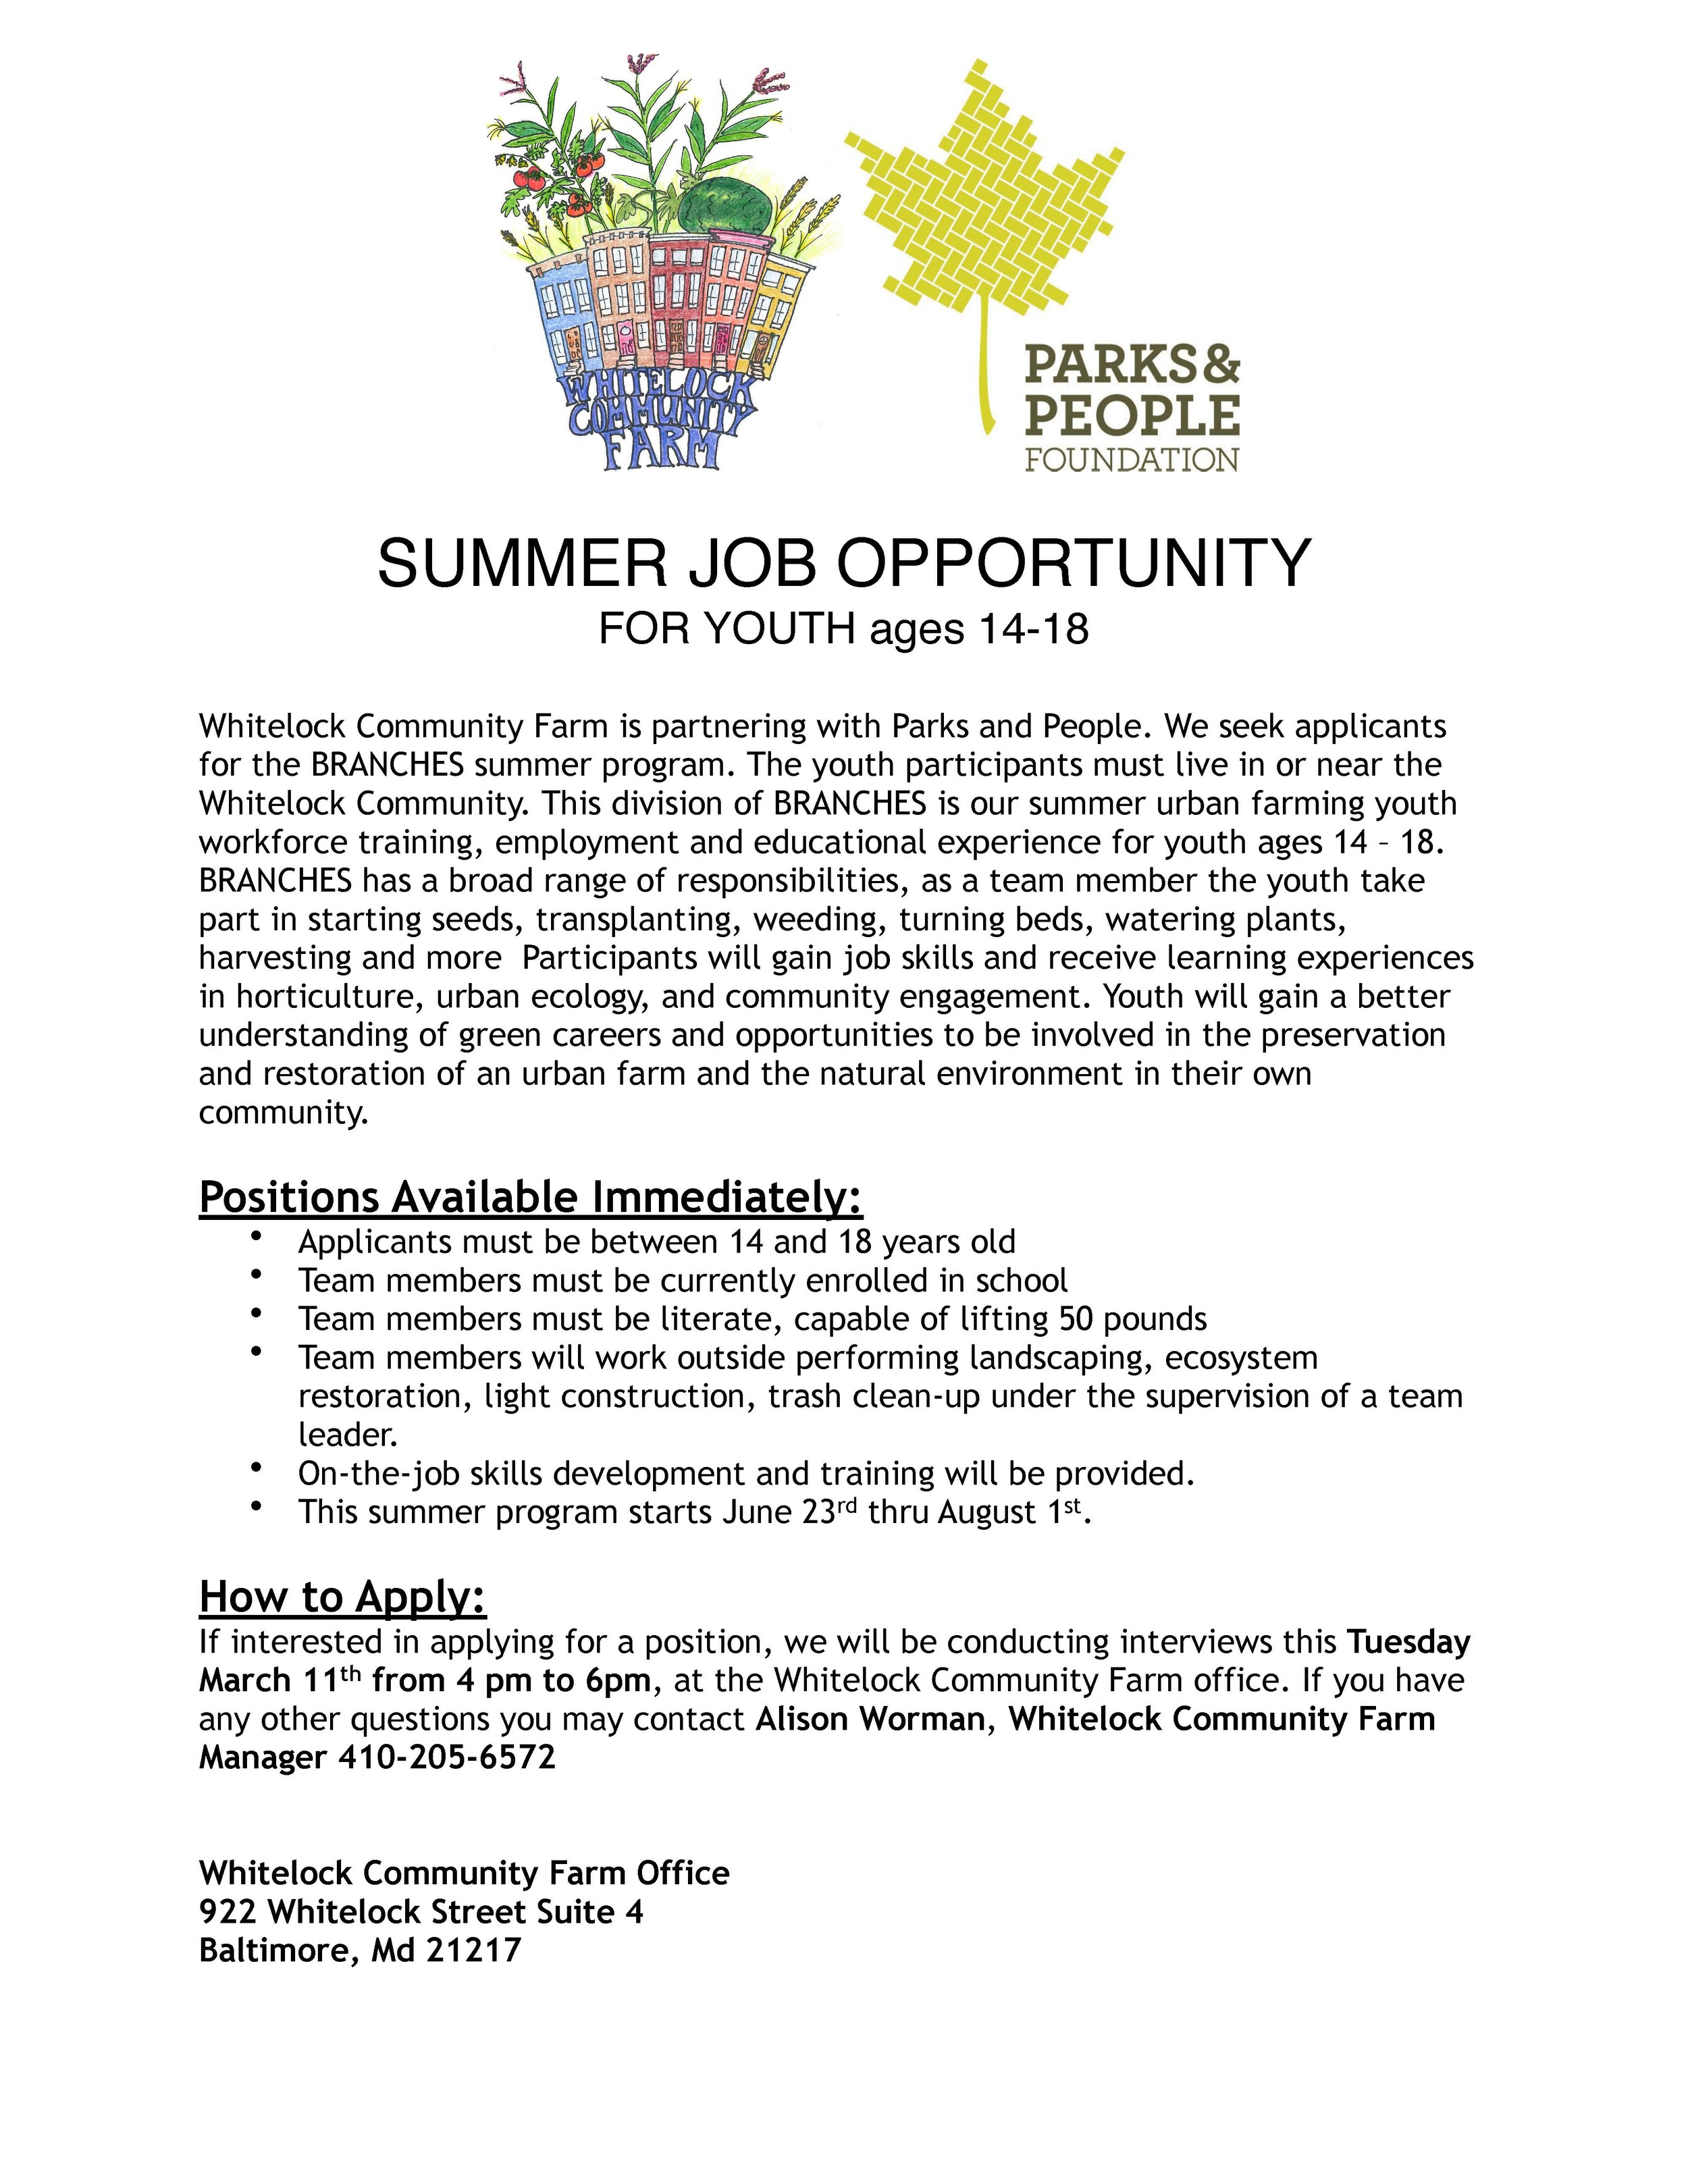 Youth jobs at Whitelock Community Farm this summer